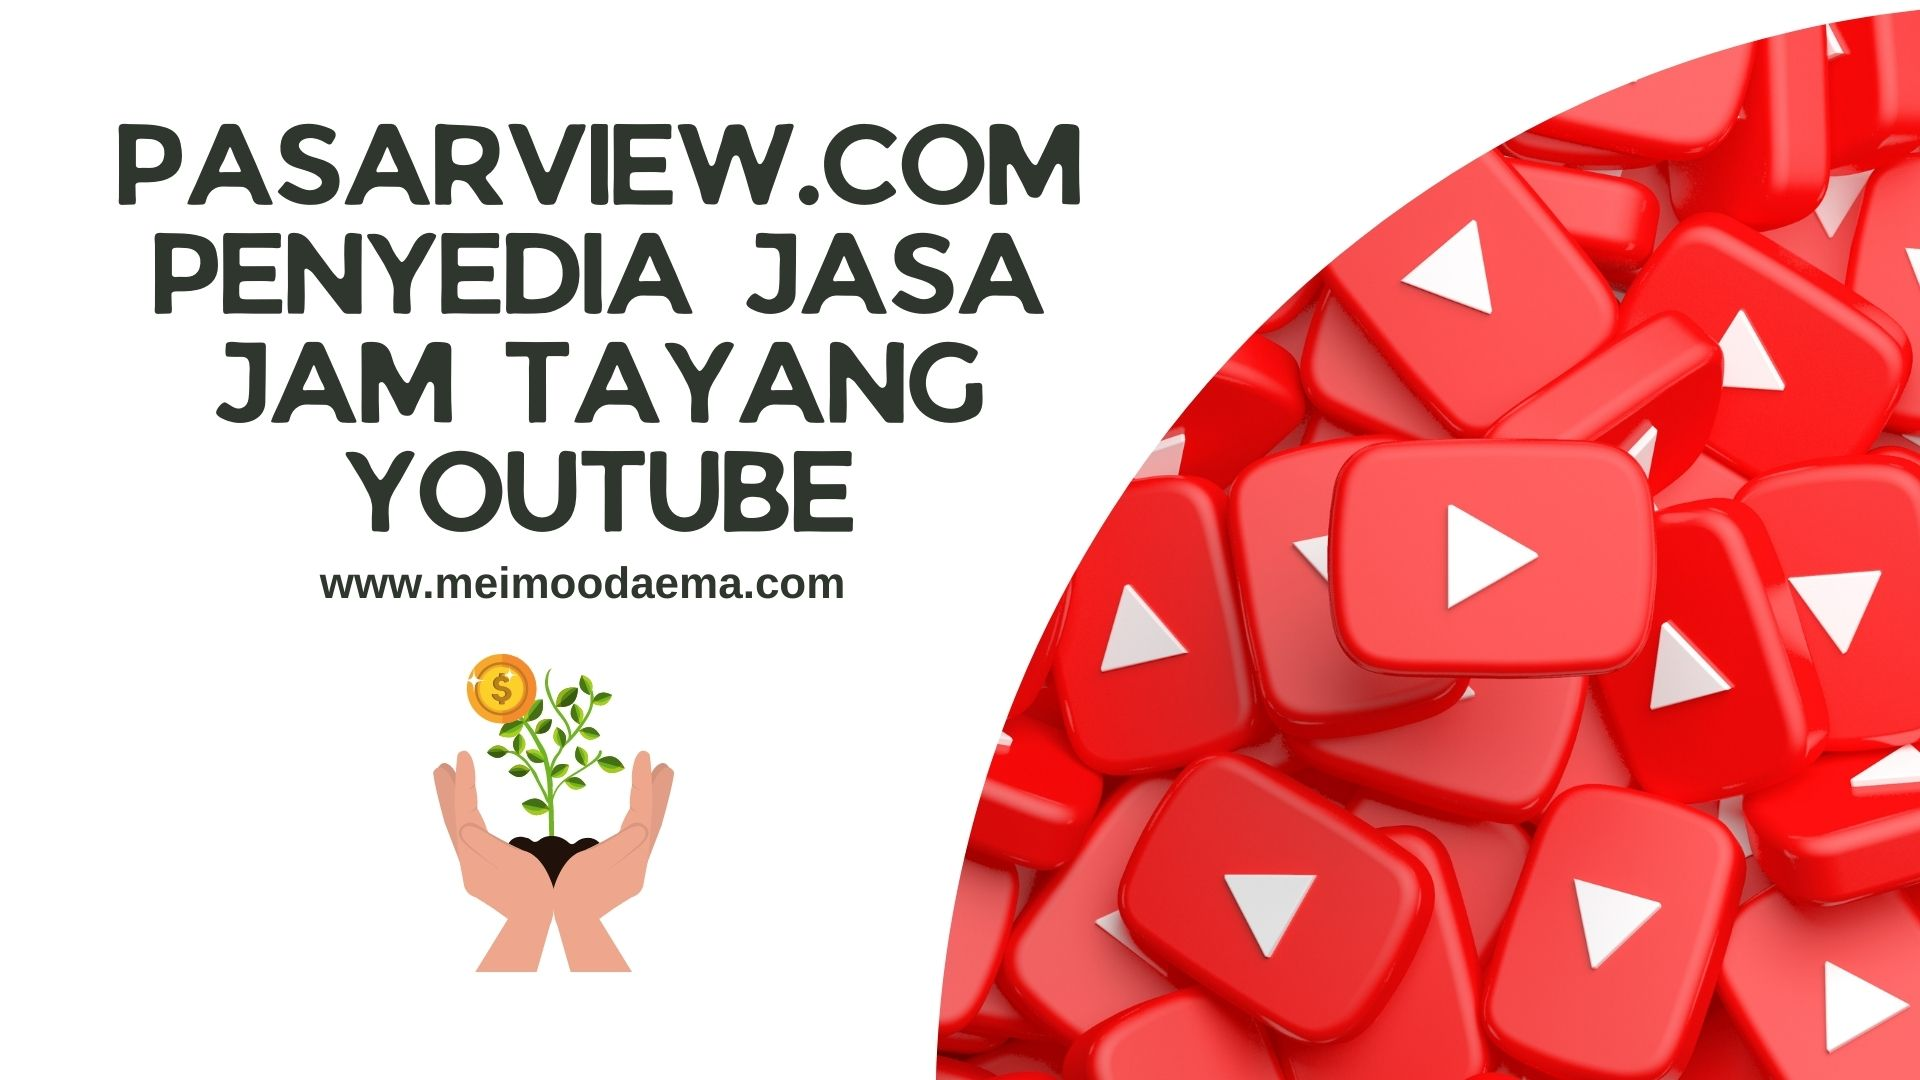 pasarview.com penyedia jasa jam tayang youtube